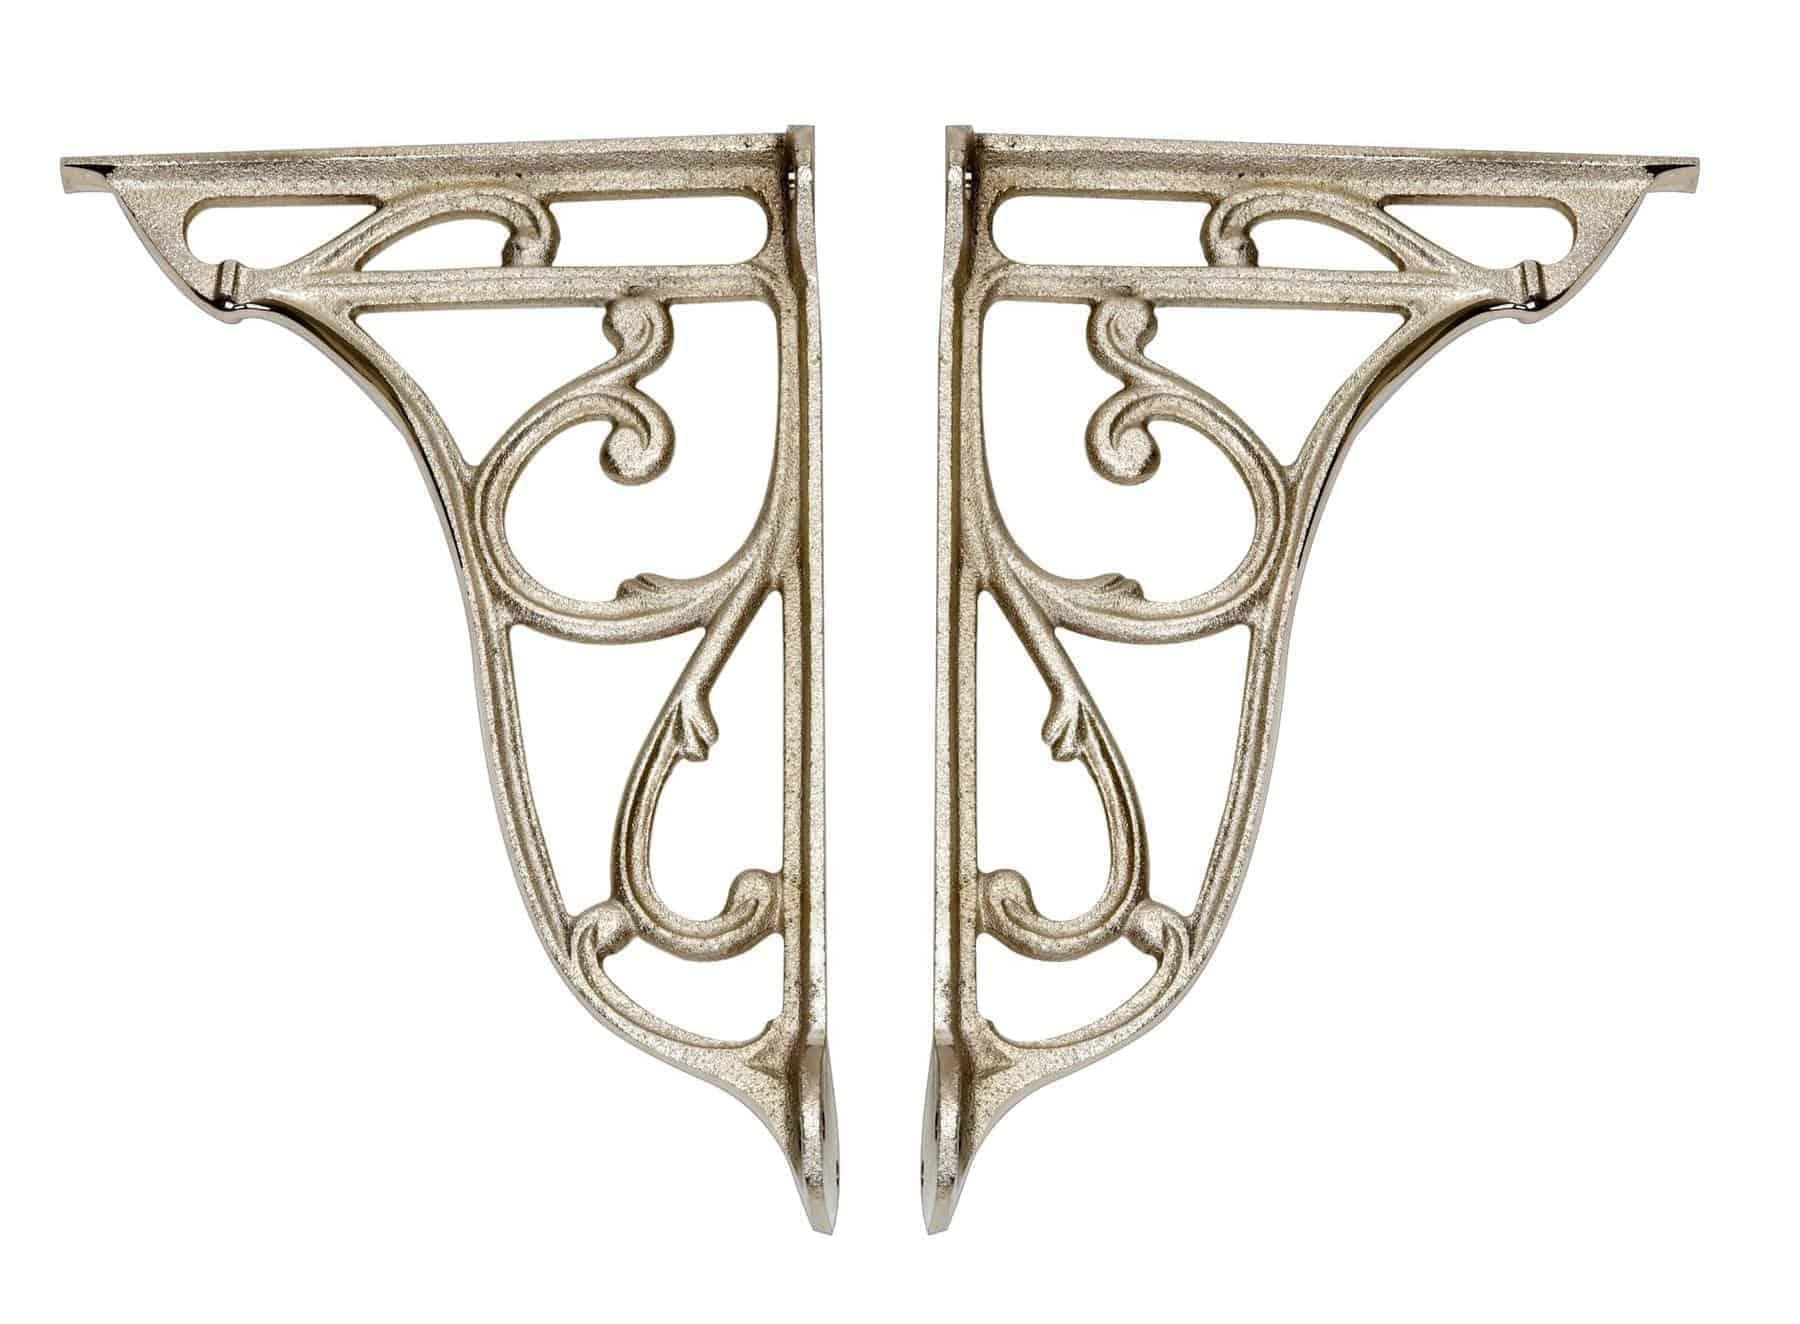 Ornate Brackets